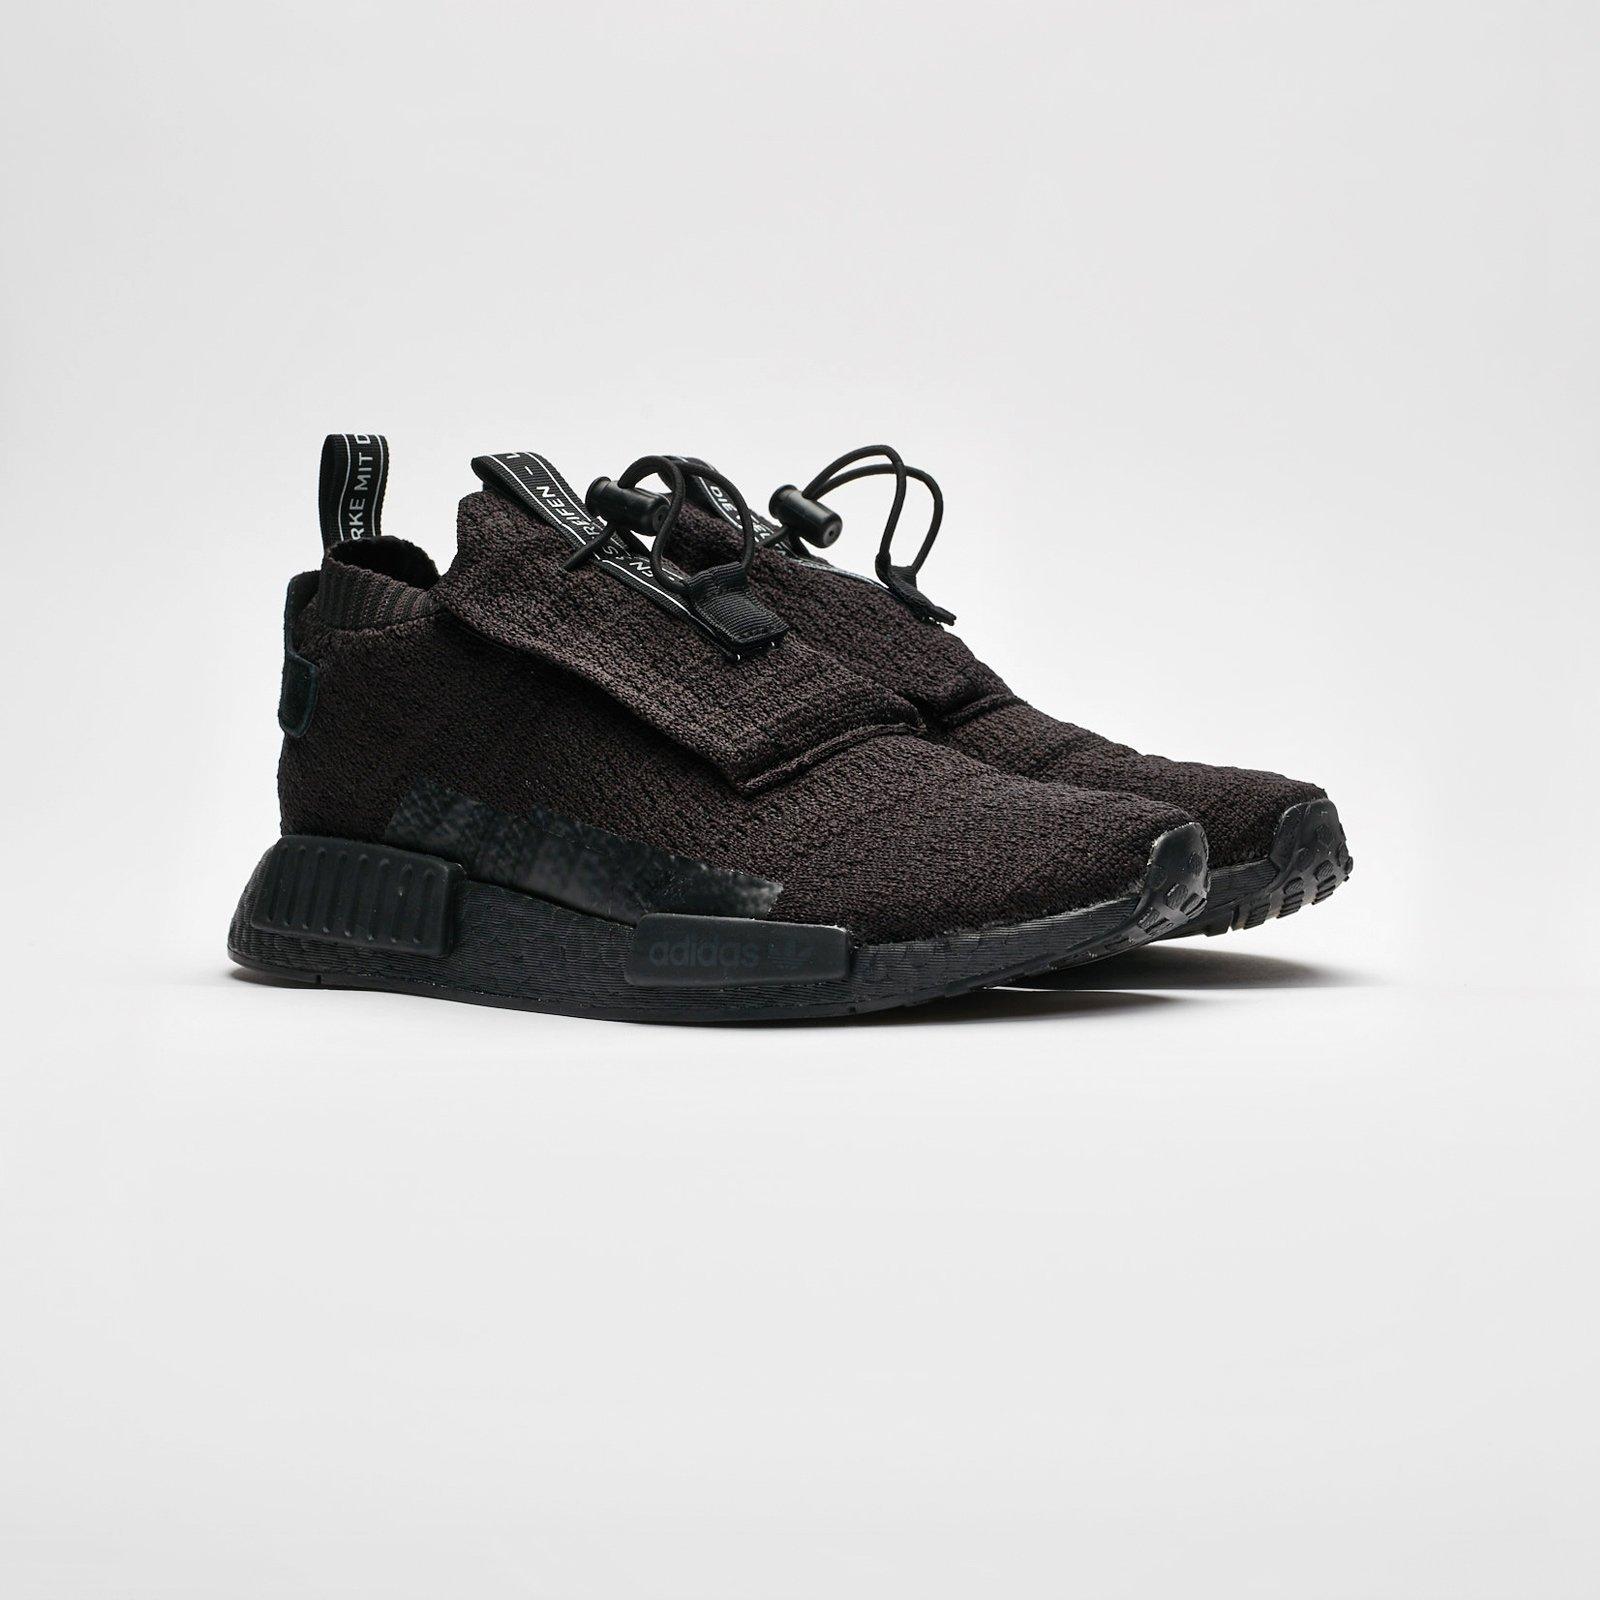 7c302945611ad adidas NMD TS1 PK GORE-TEX - Aq0927 - Sneakersnstuff